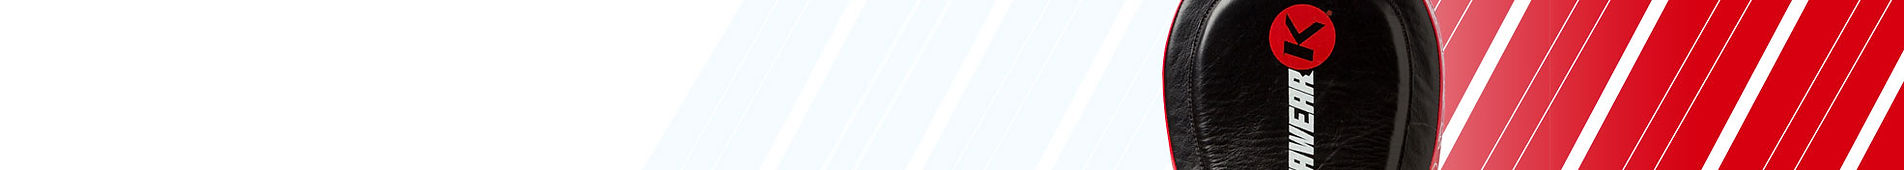 Focus-Pads-Banner.jpg